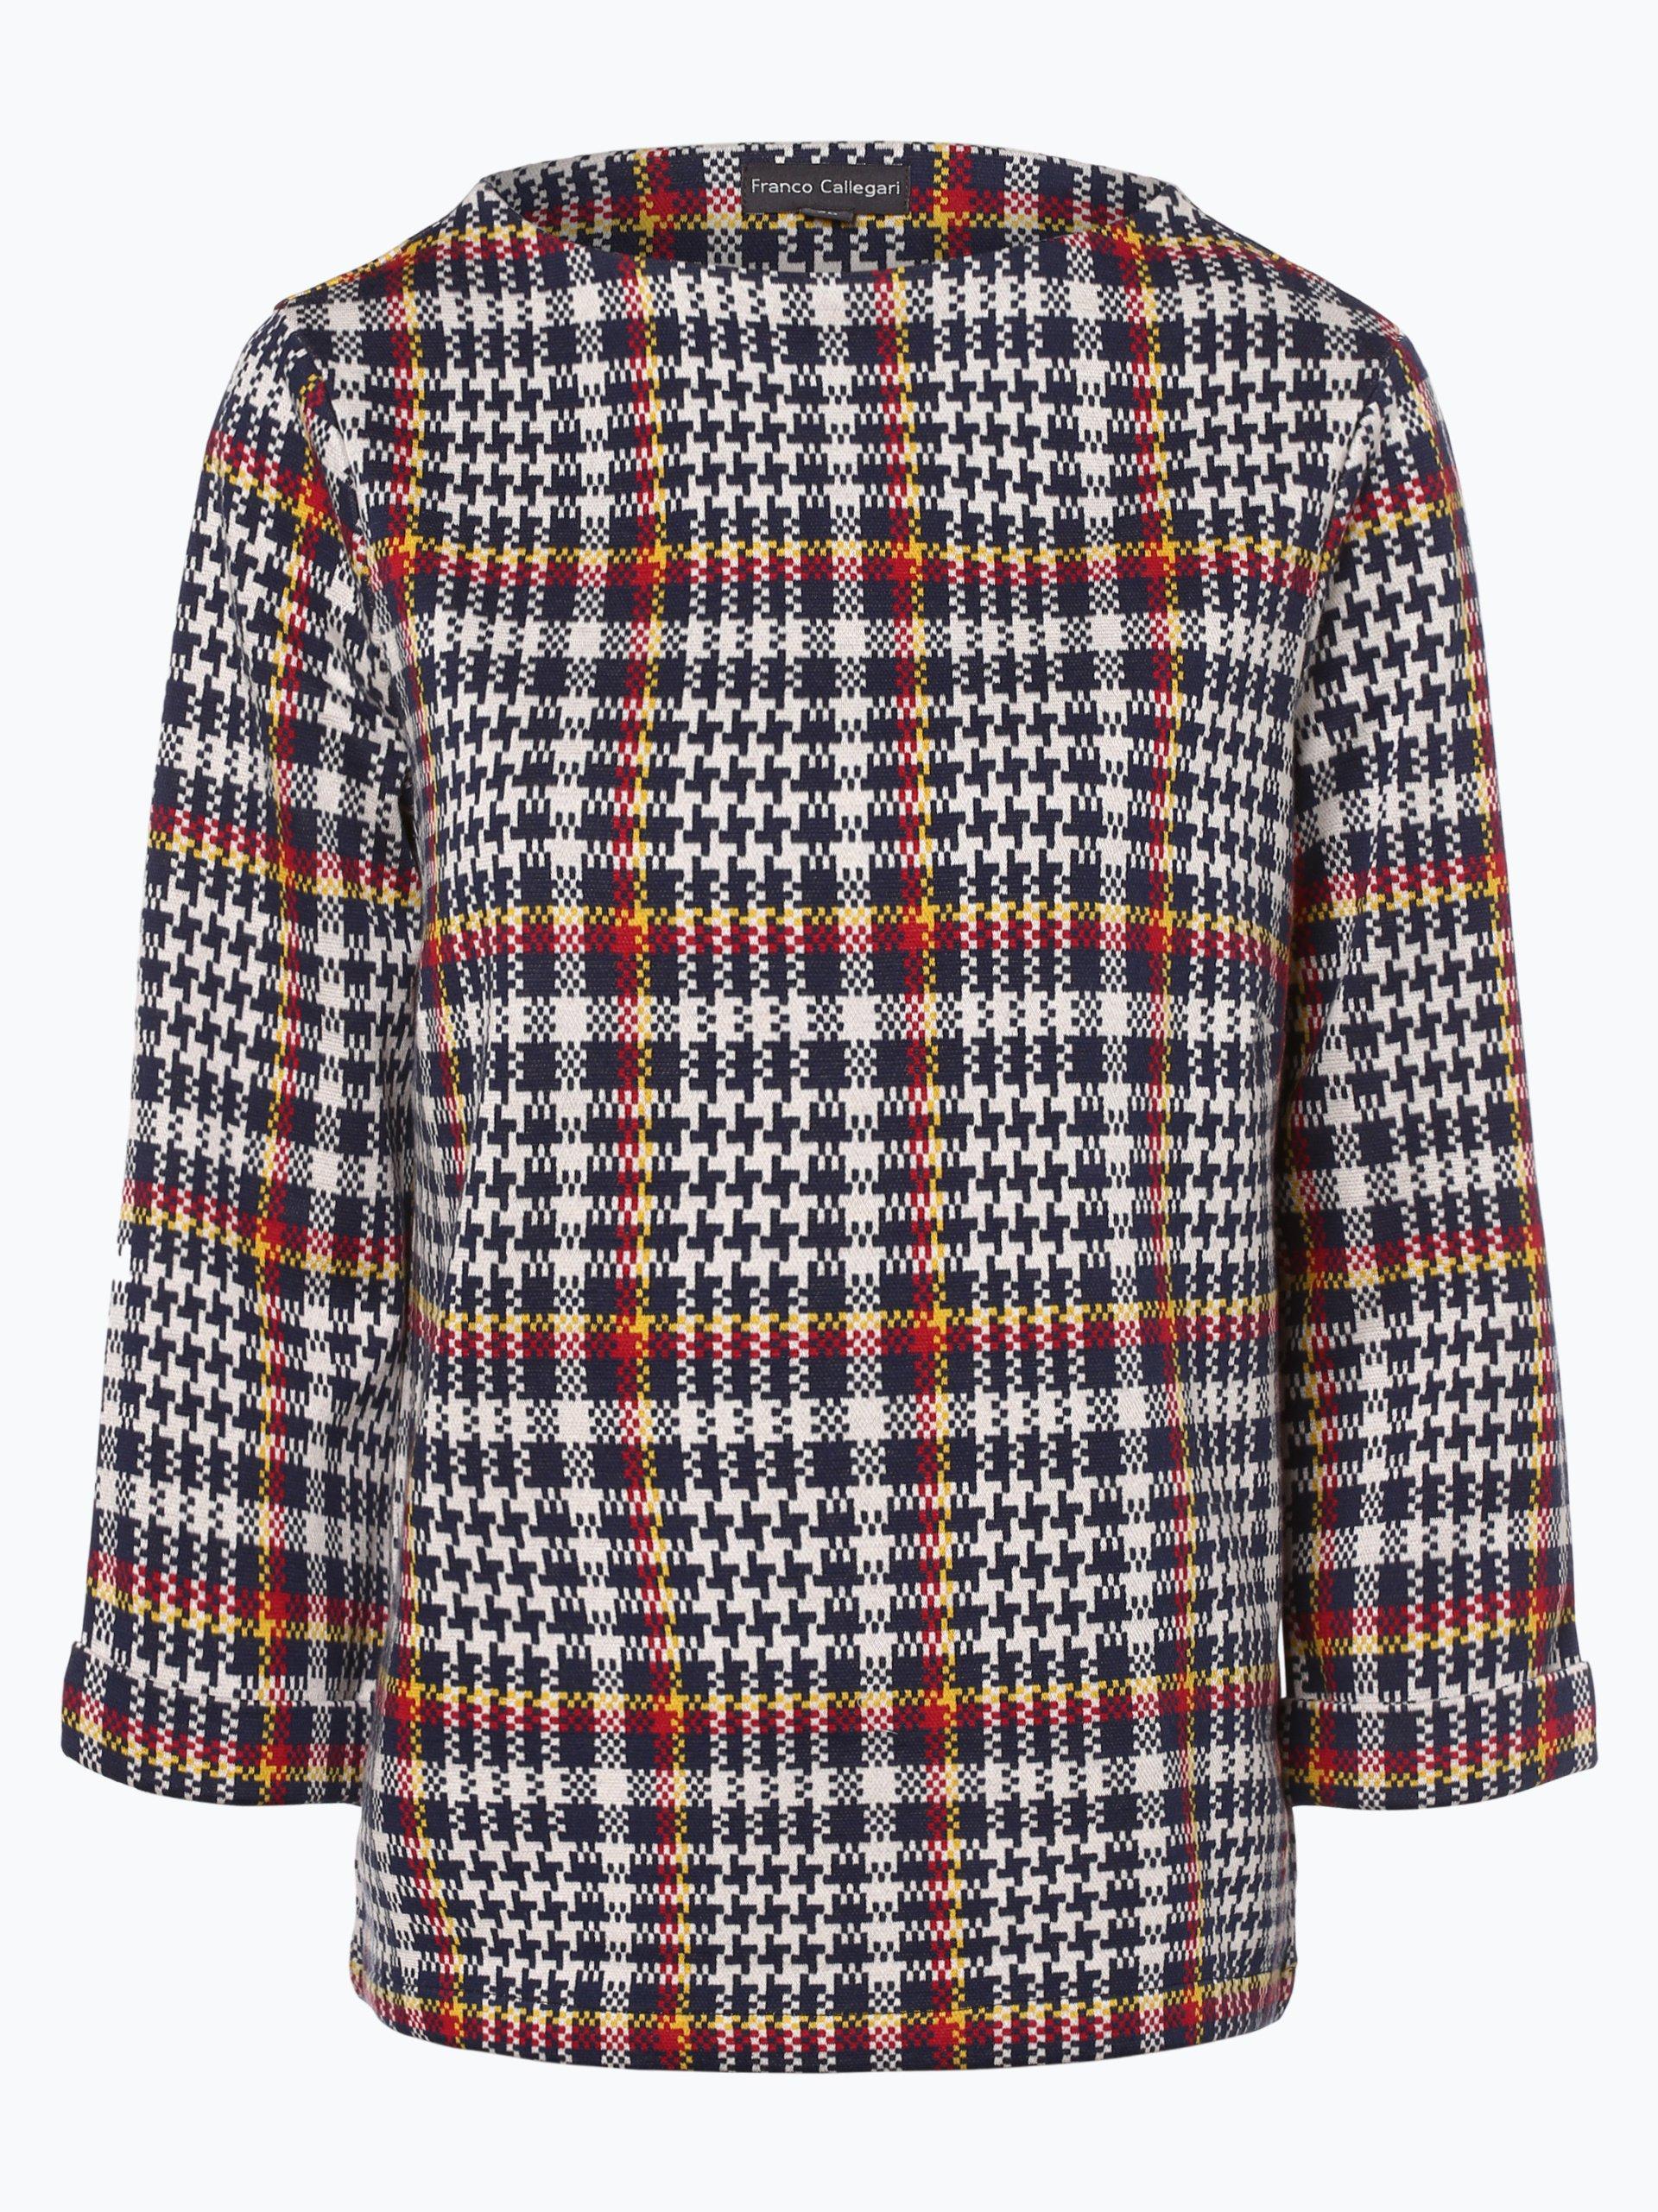 Franco Callegari Damen Blusenshirt